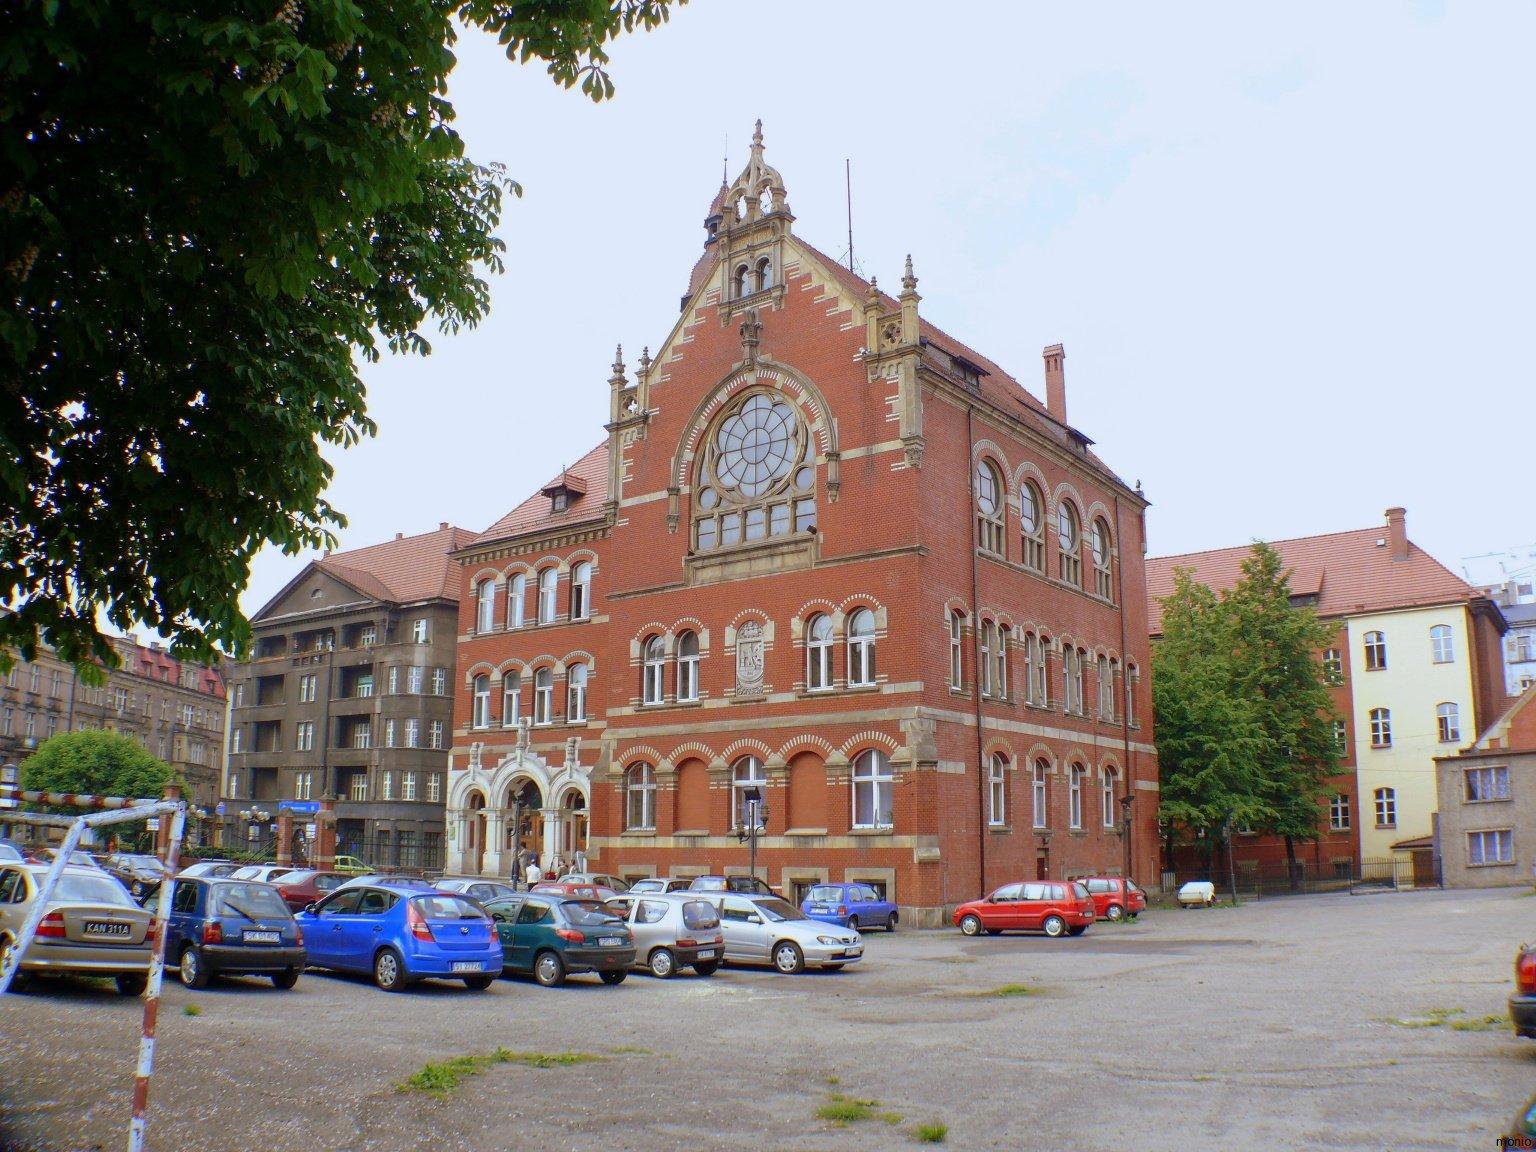 11elewGimnazjumKatowice